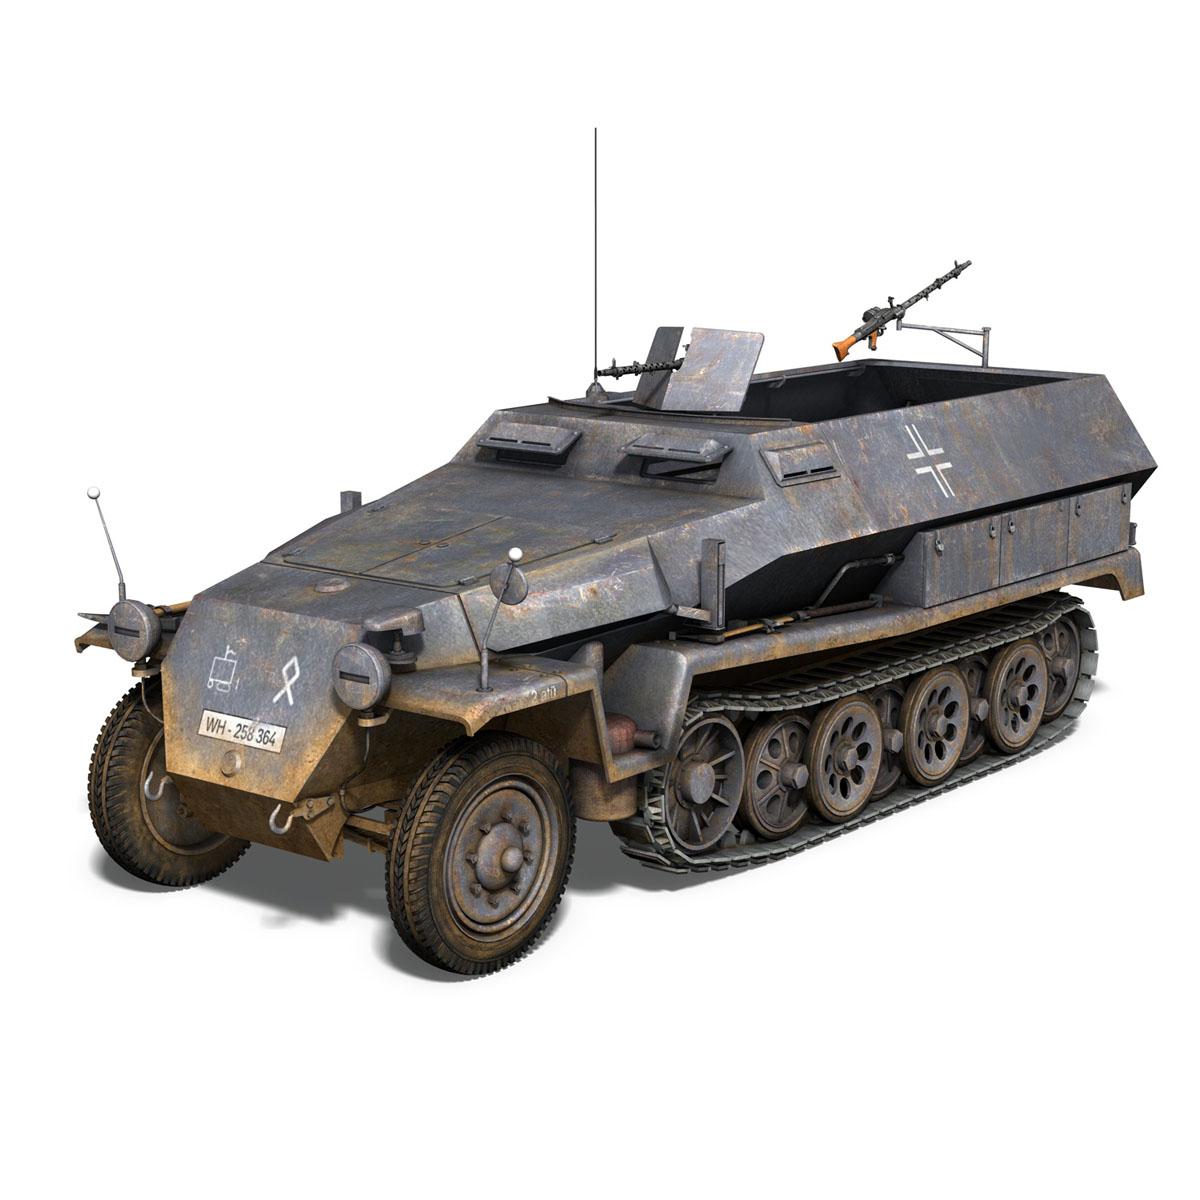 sd.kfz 251 1 ausf.c – half-track 3d model 3ds fbx c4d lwo obj 201391